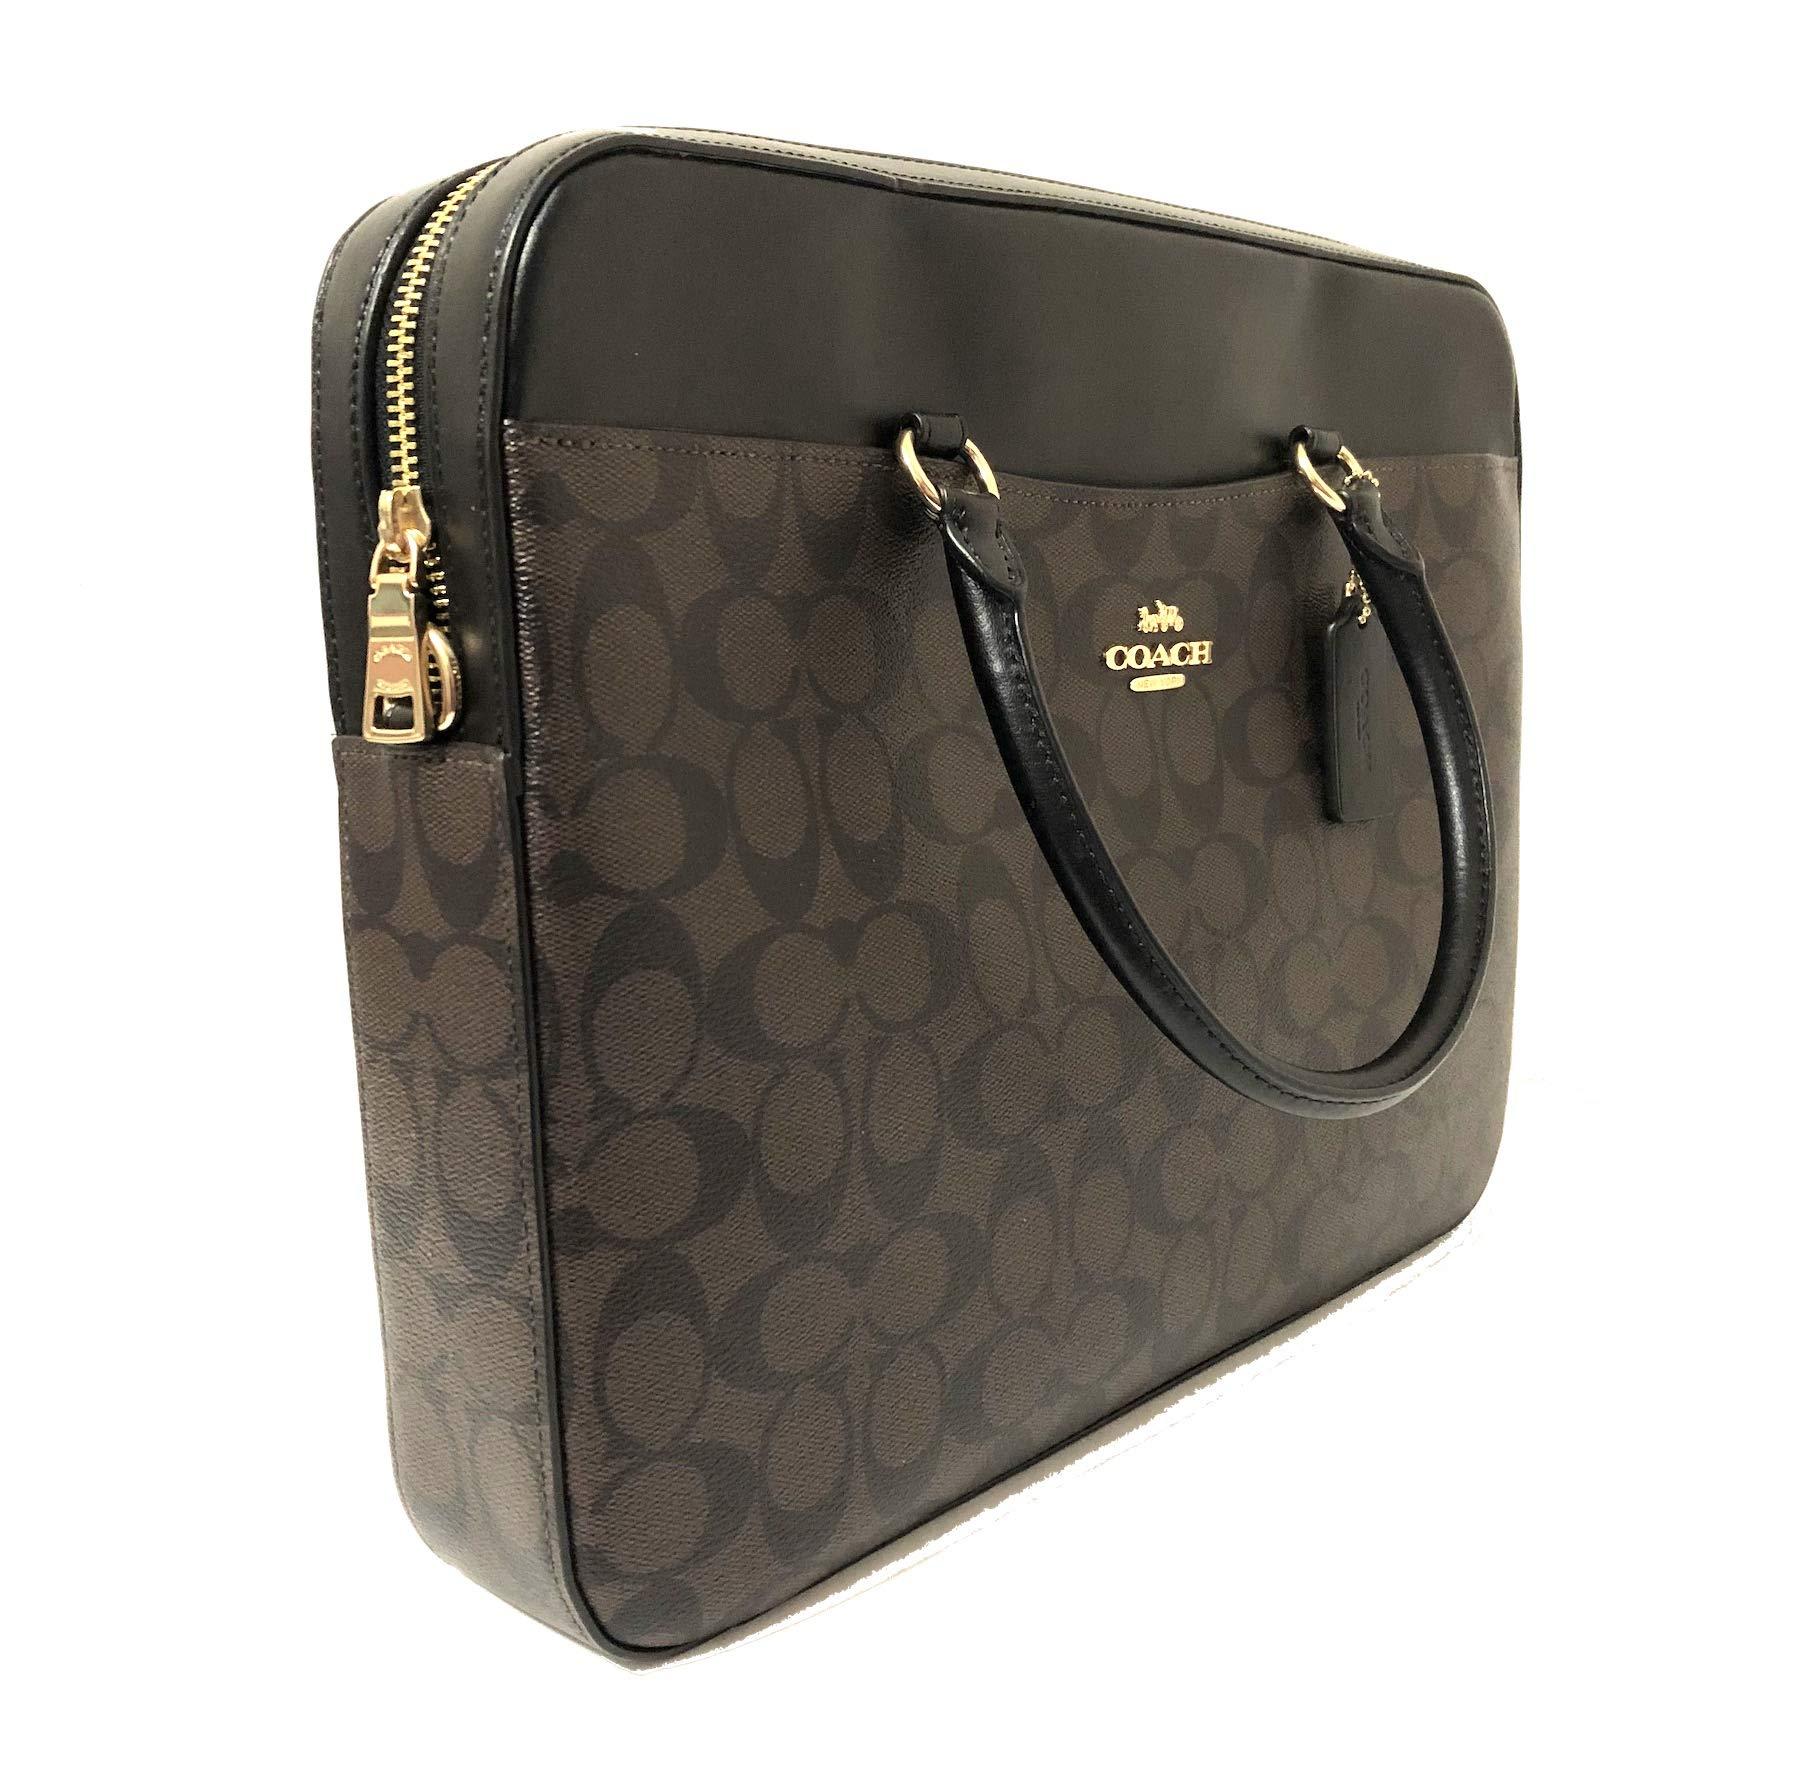 COACH Signature Laptop Bag F39023 Brown/Black by Coach (Image #2)